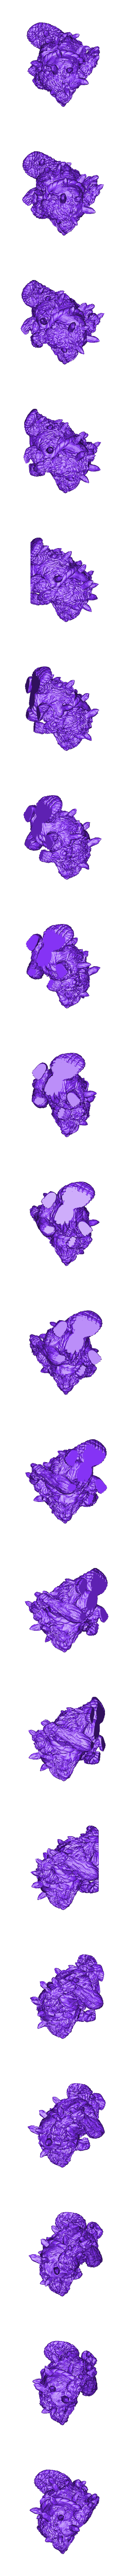 Zombeaver_Brute.stl Download STL file Beavermancer Set • Object to 3D print, PorcSkulpt9